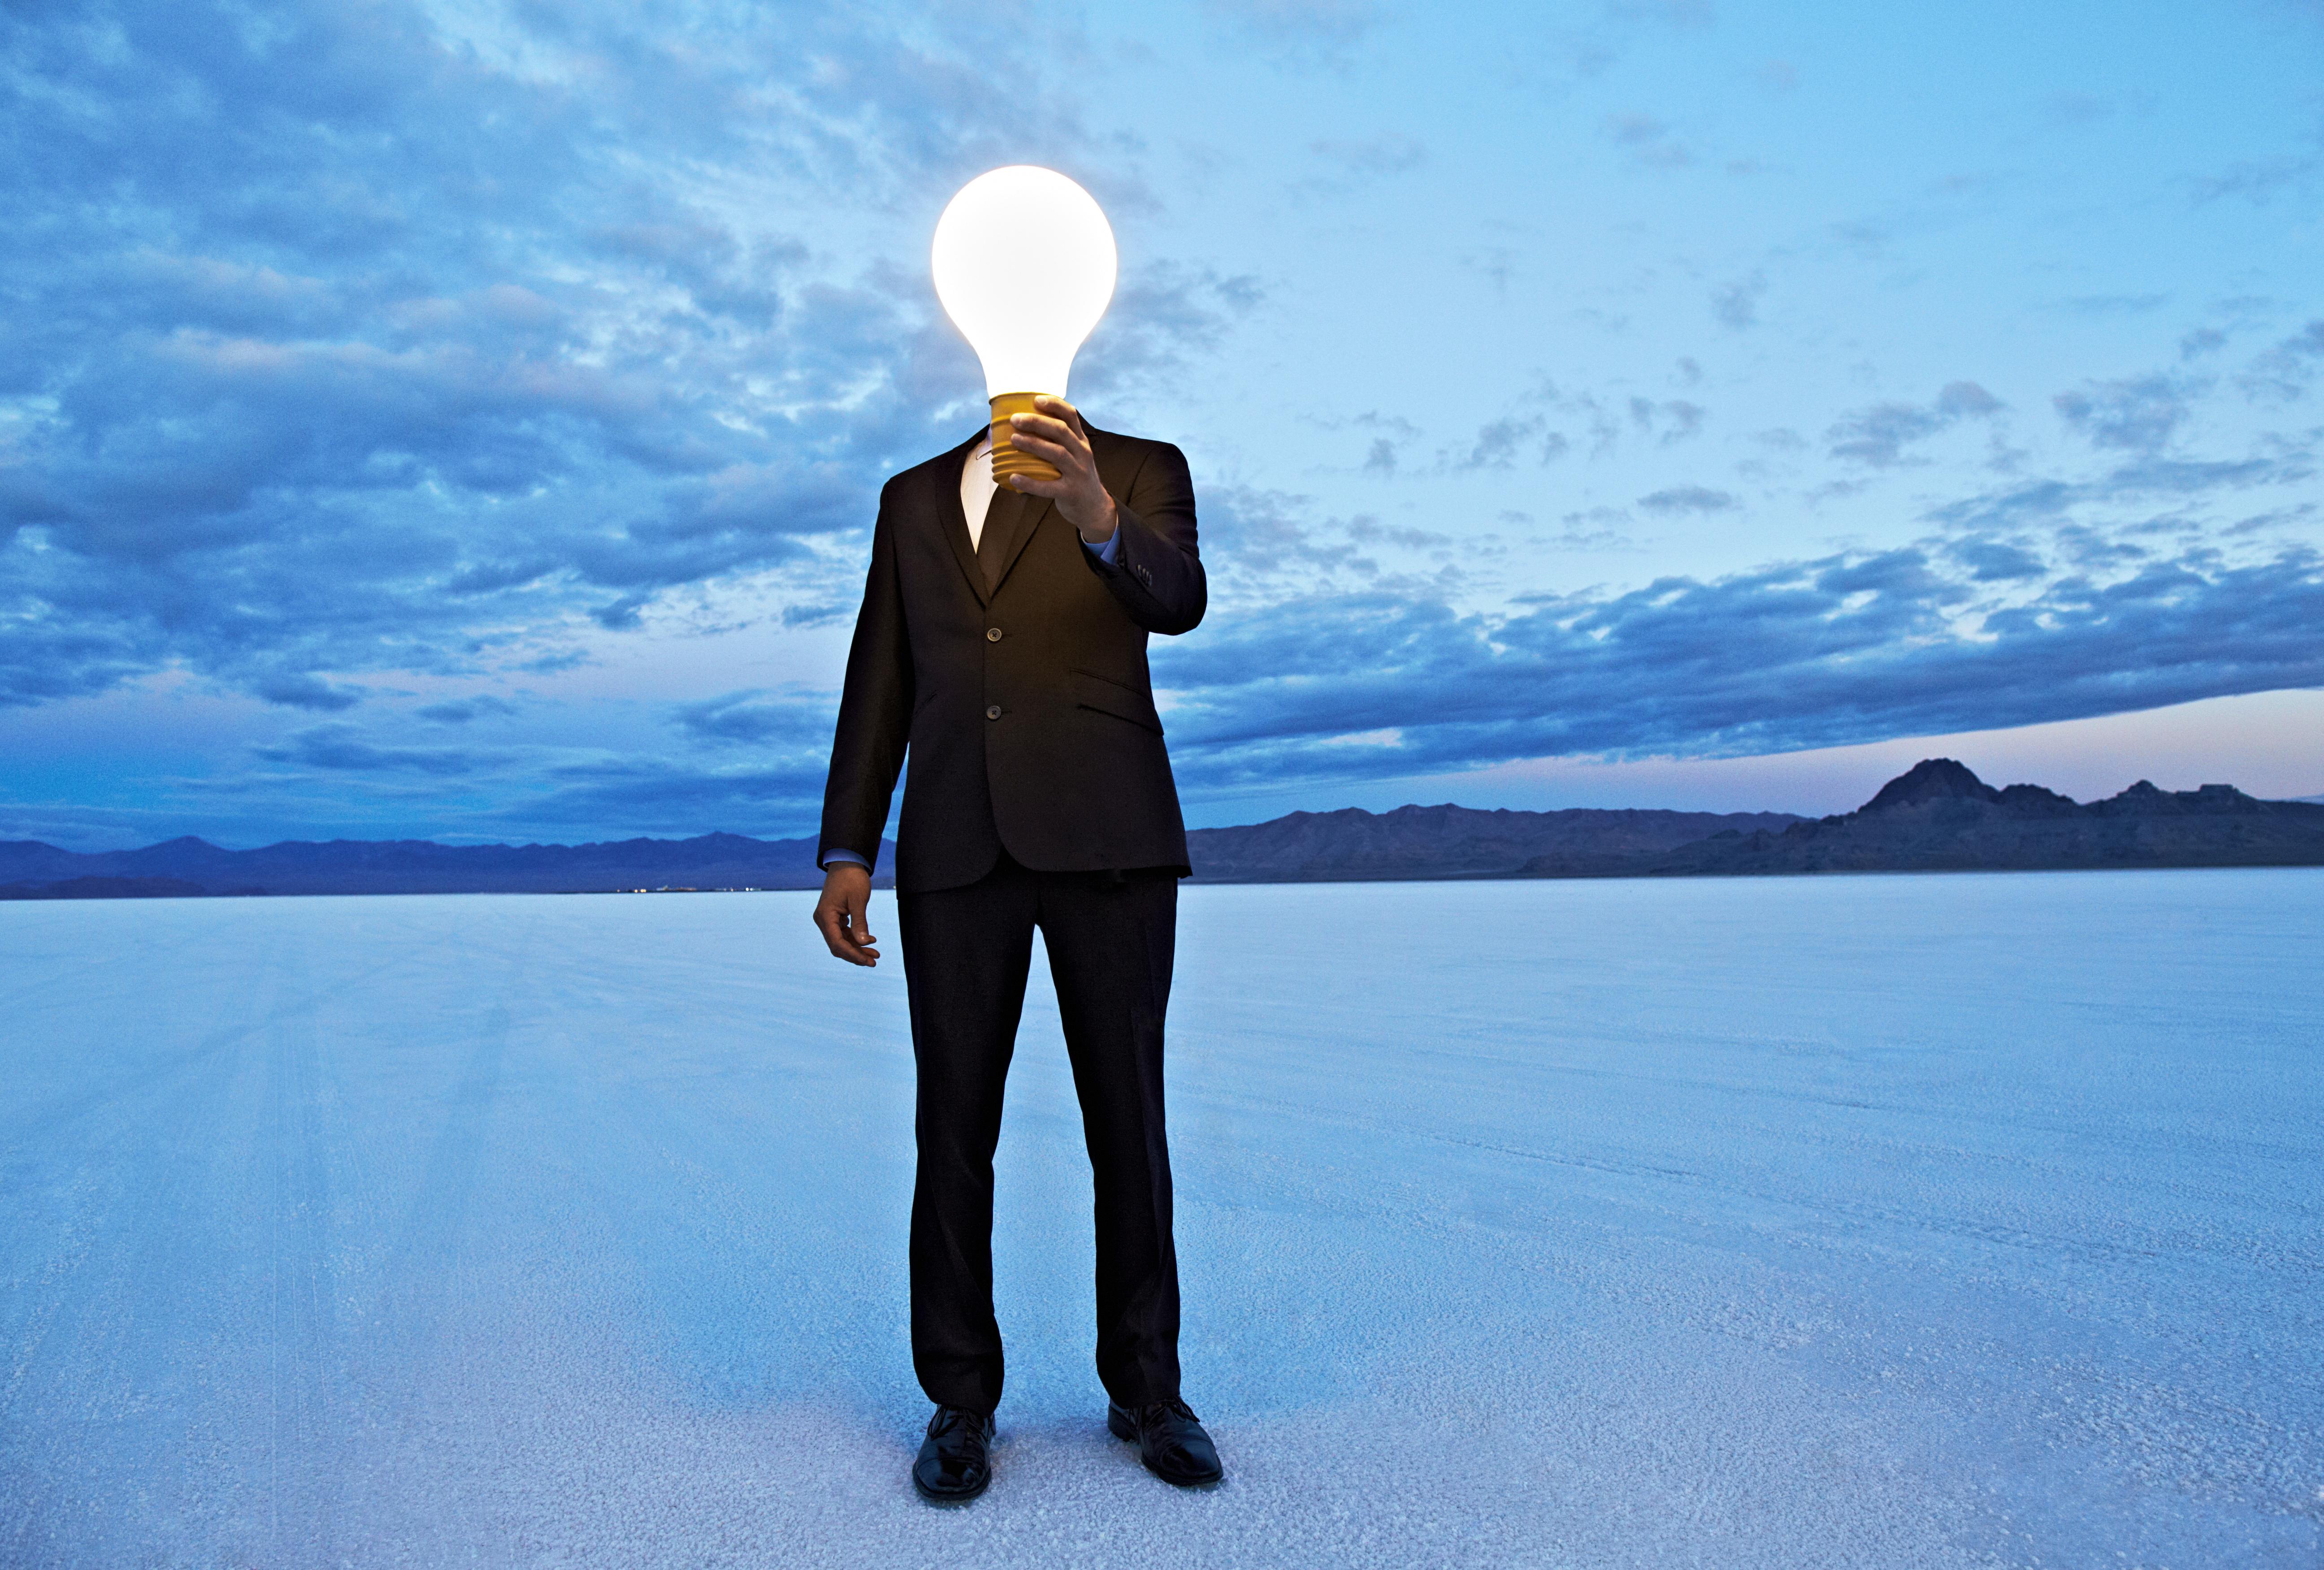 Man holding giant lightbulb in front of head.